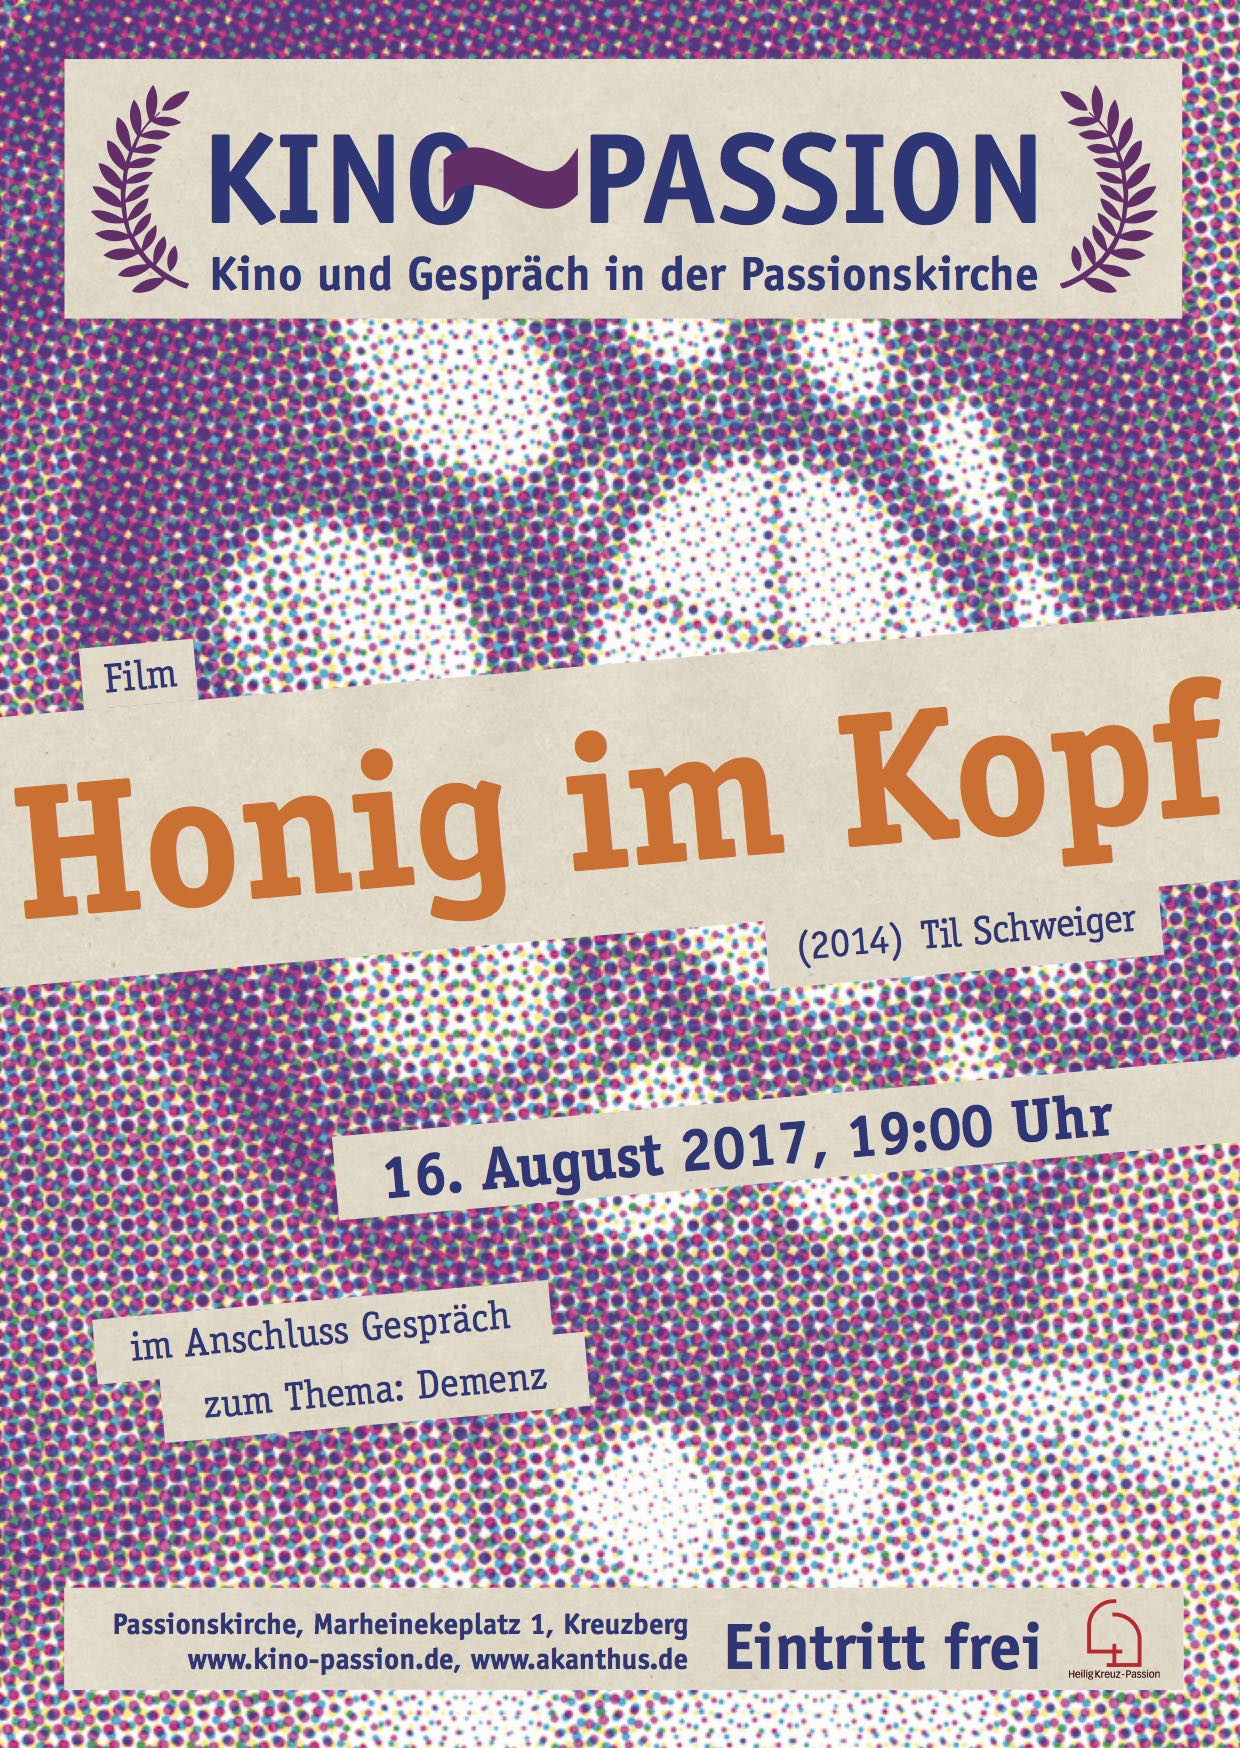 71_Kino_Passion_Honik Im Kopf.jpg